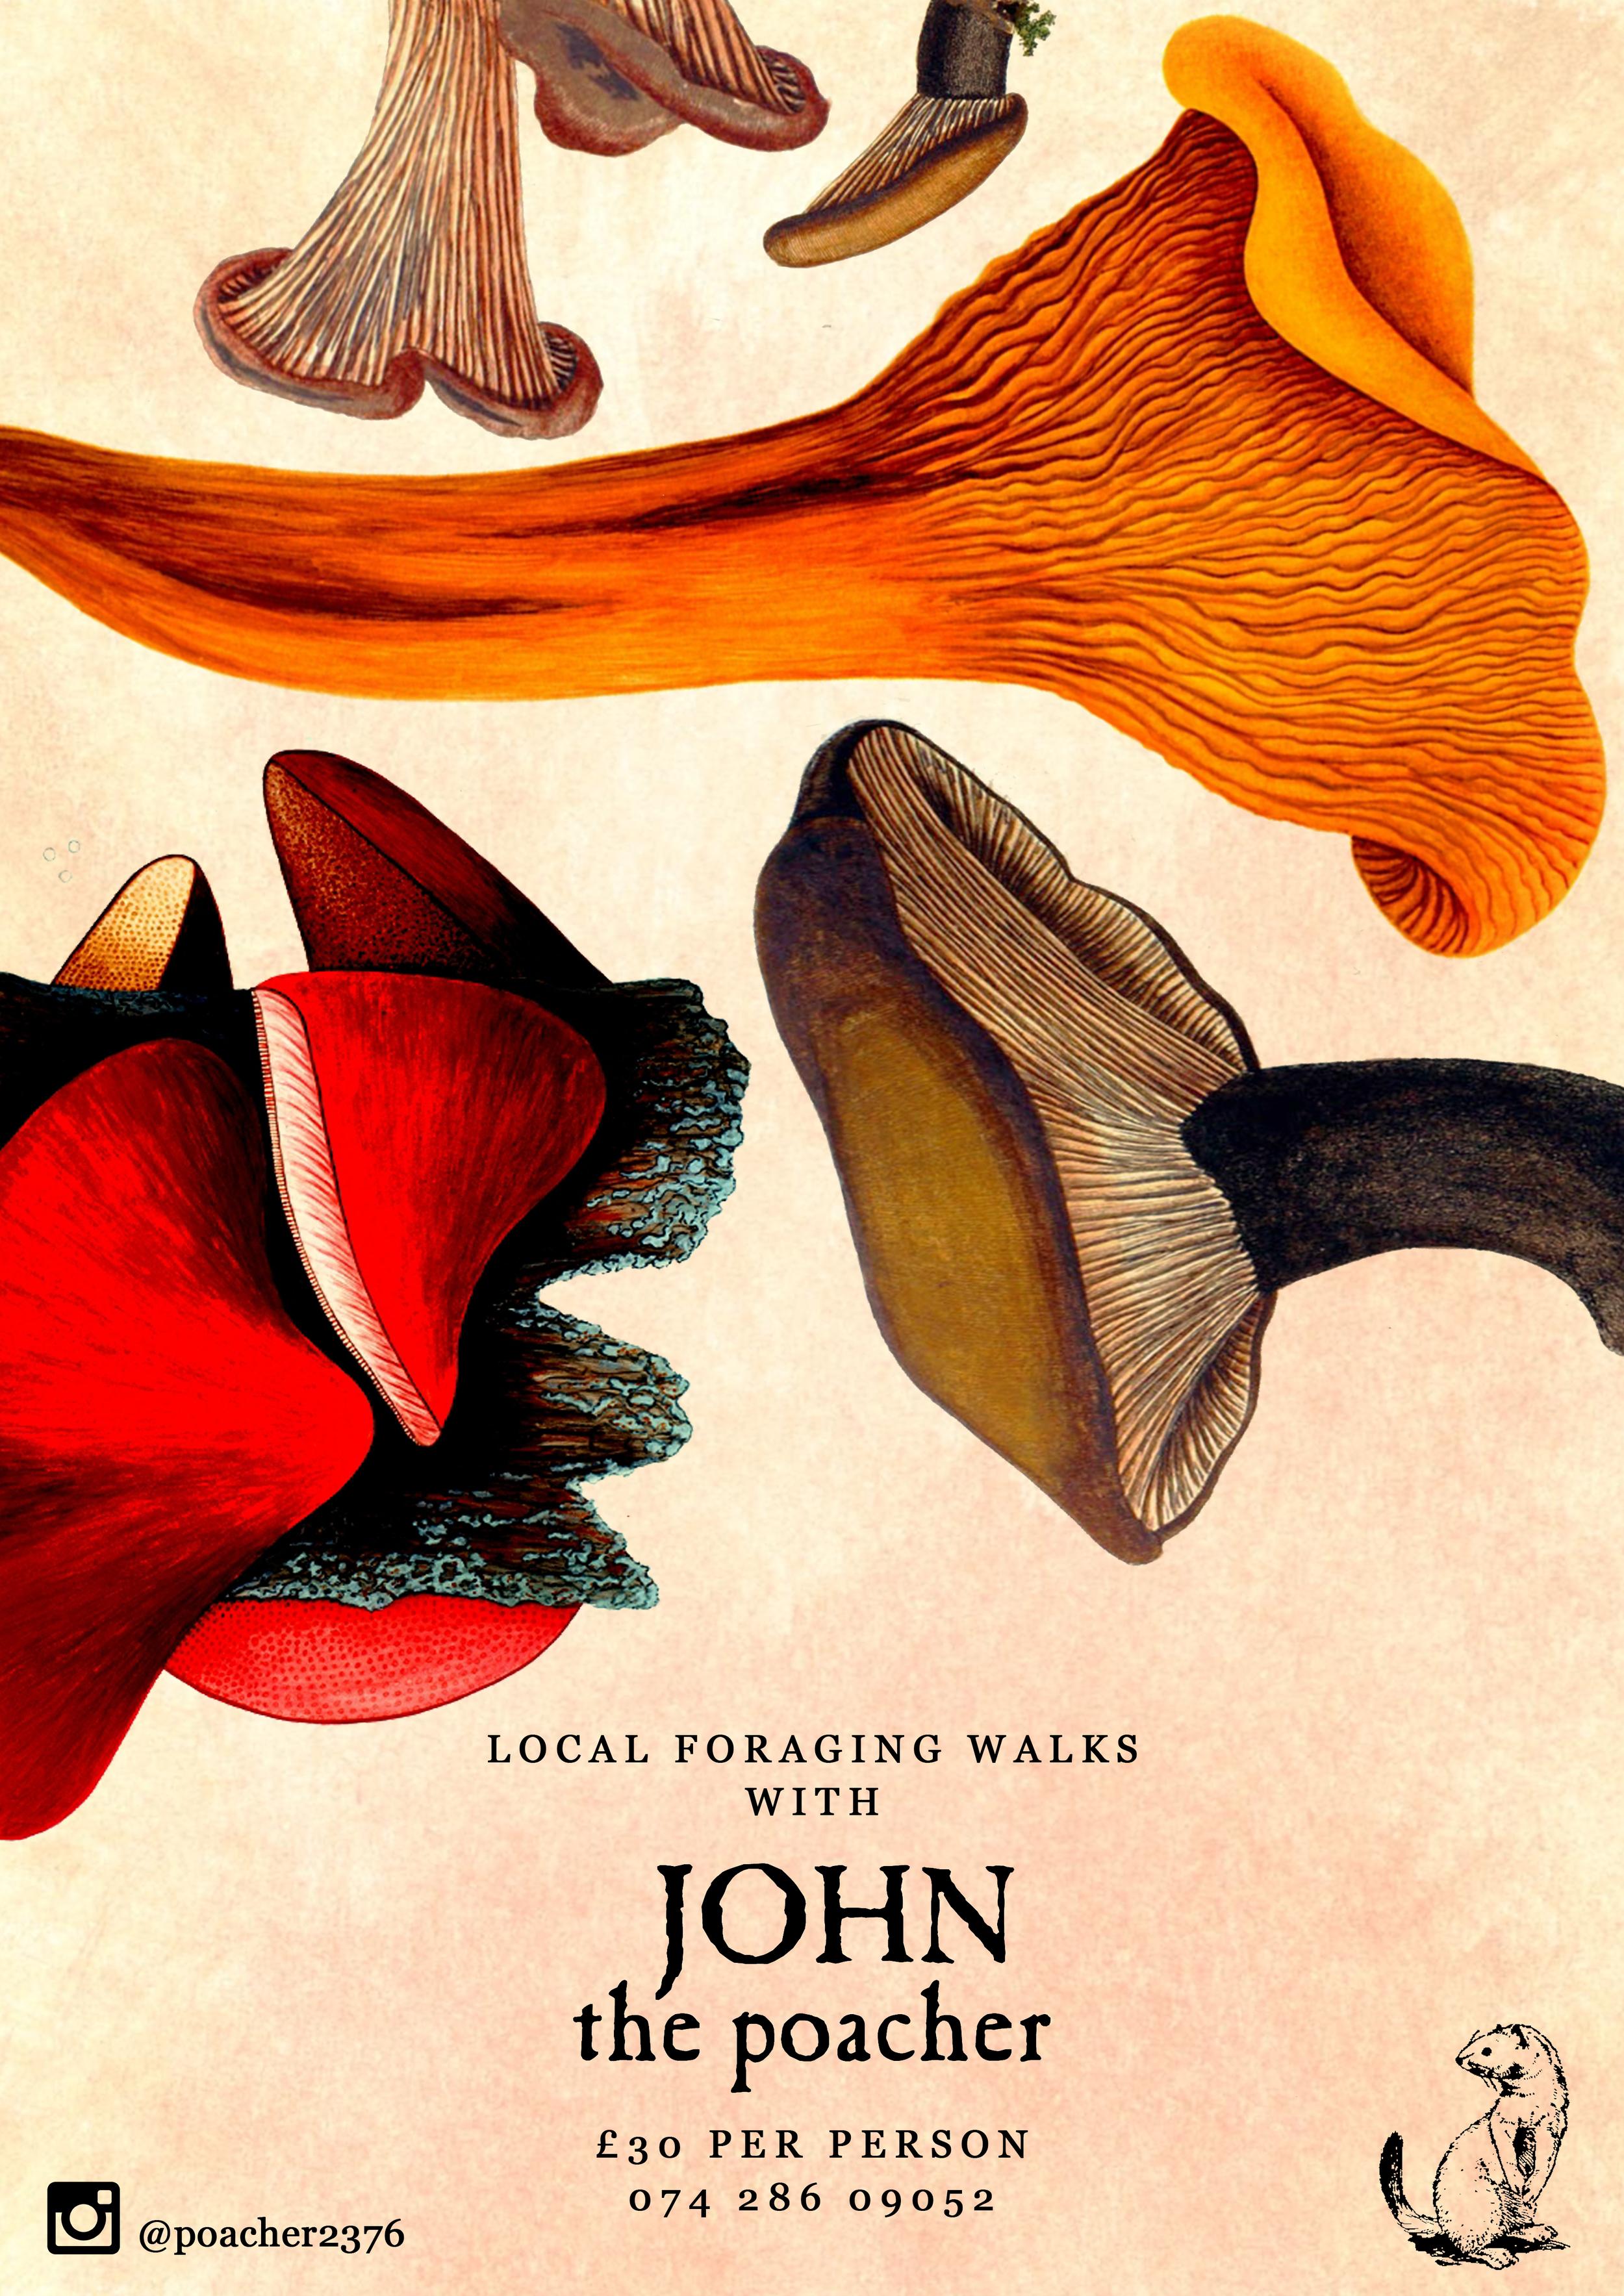 FORAGING WALKS WITH JOHN THE POACHER